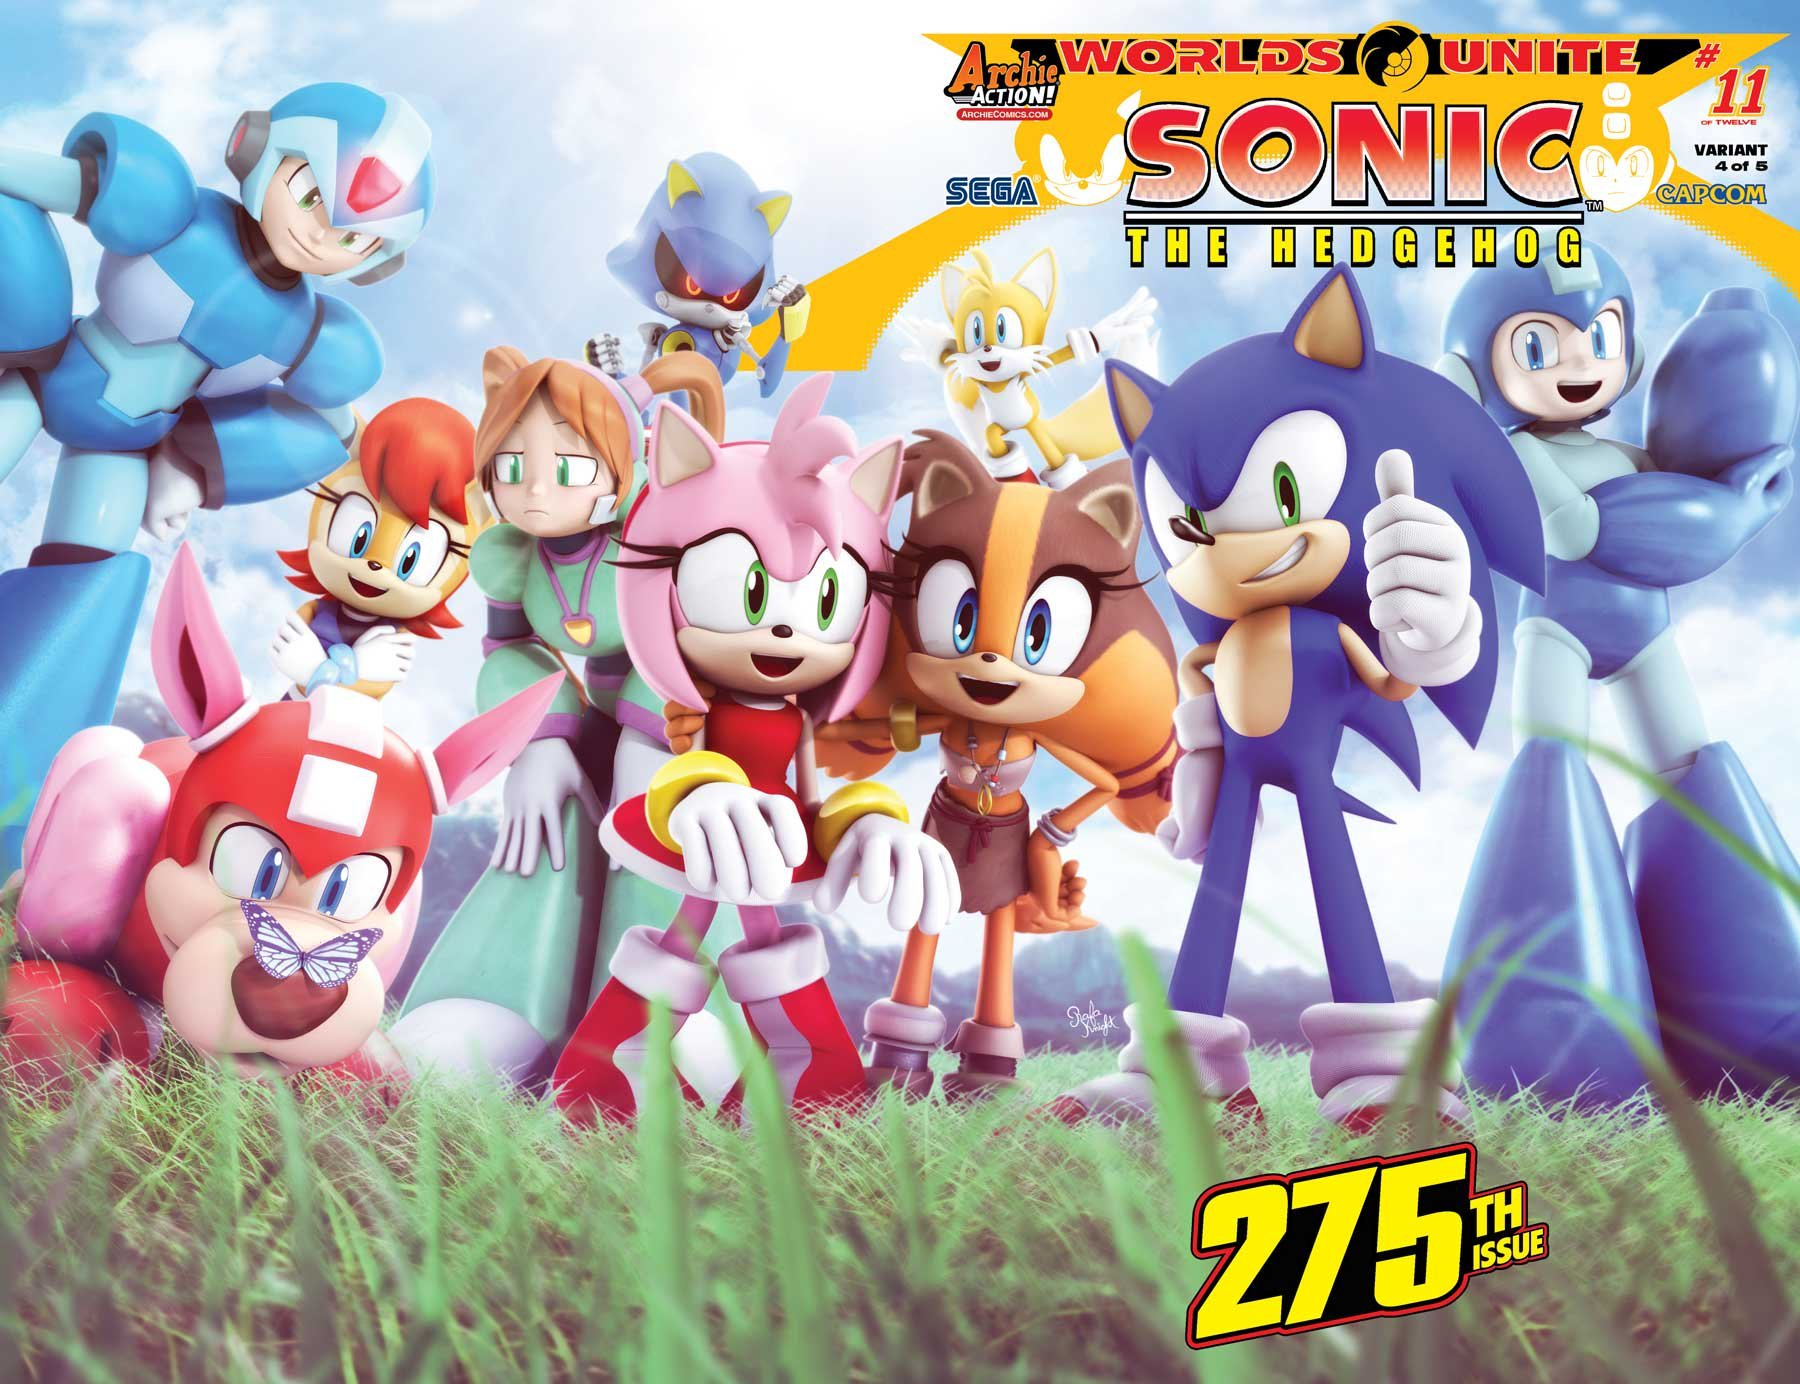 Sonic the Hedgehog 275 (October 2015) (variant 4)